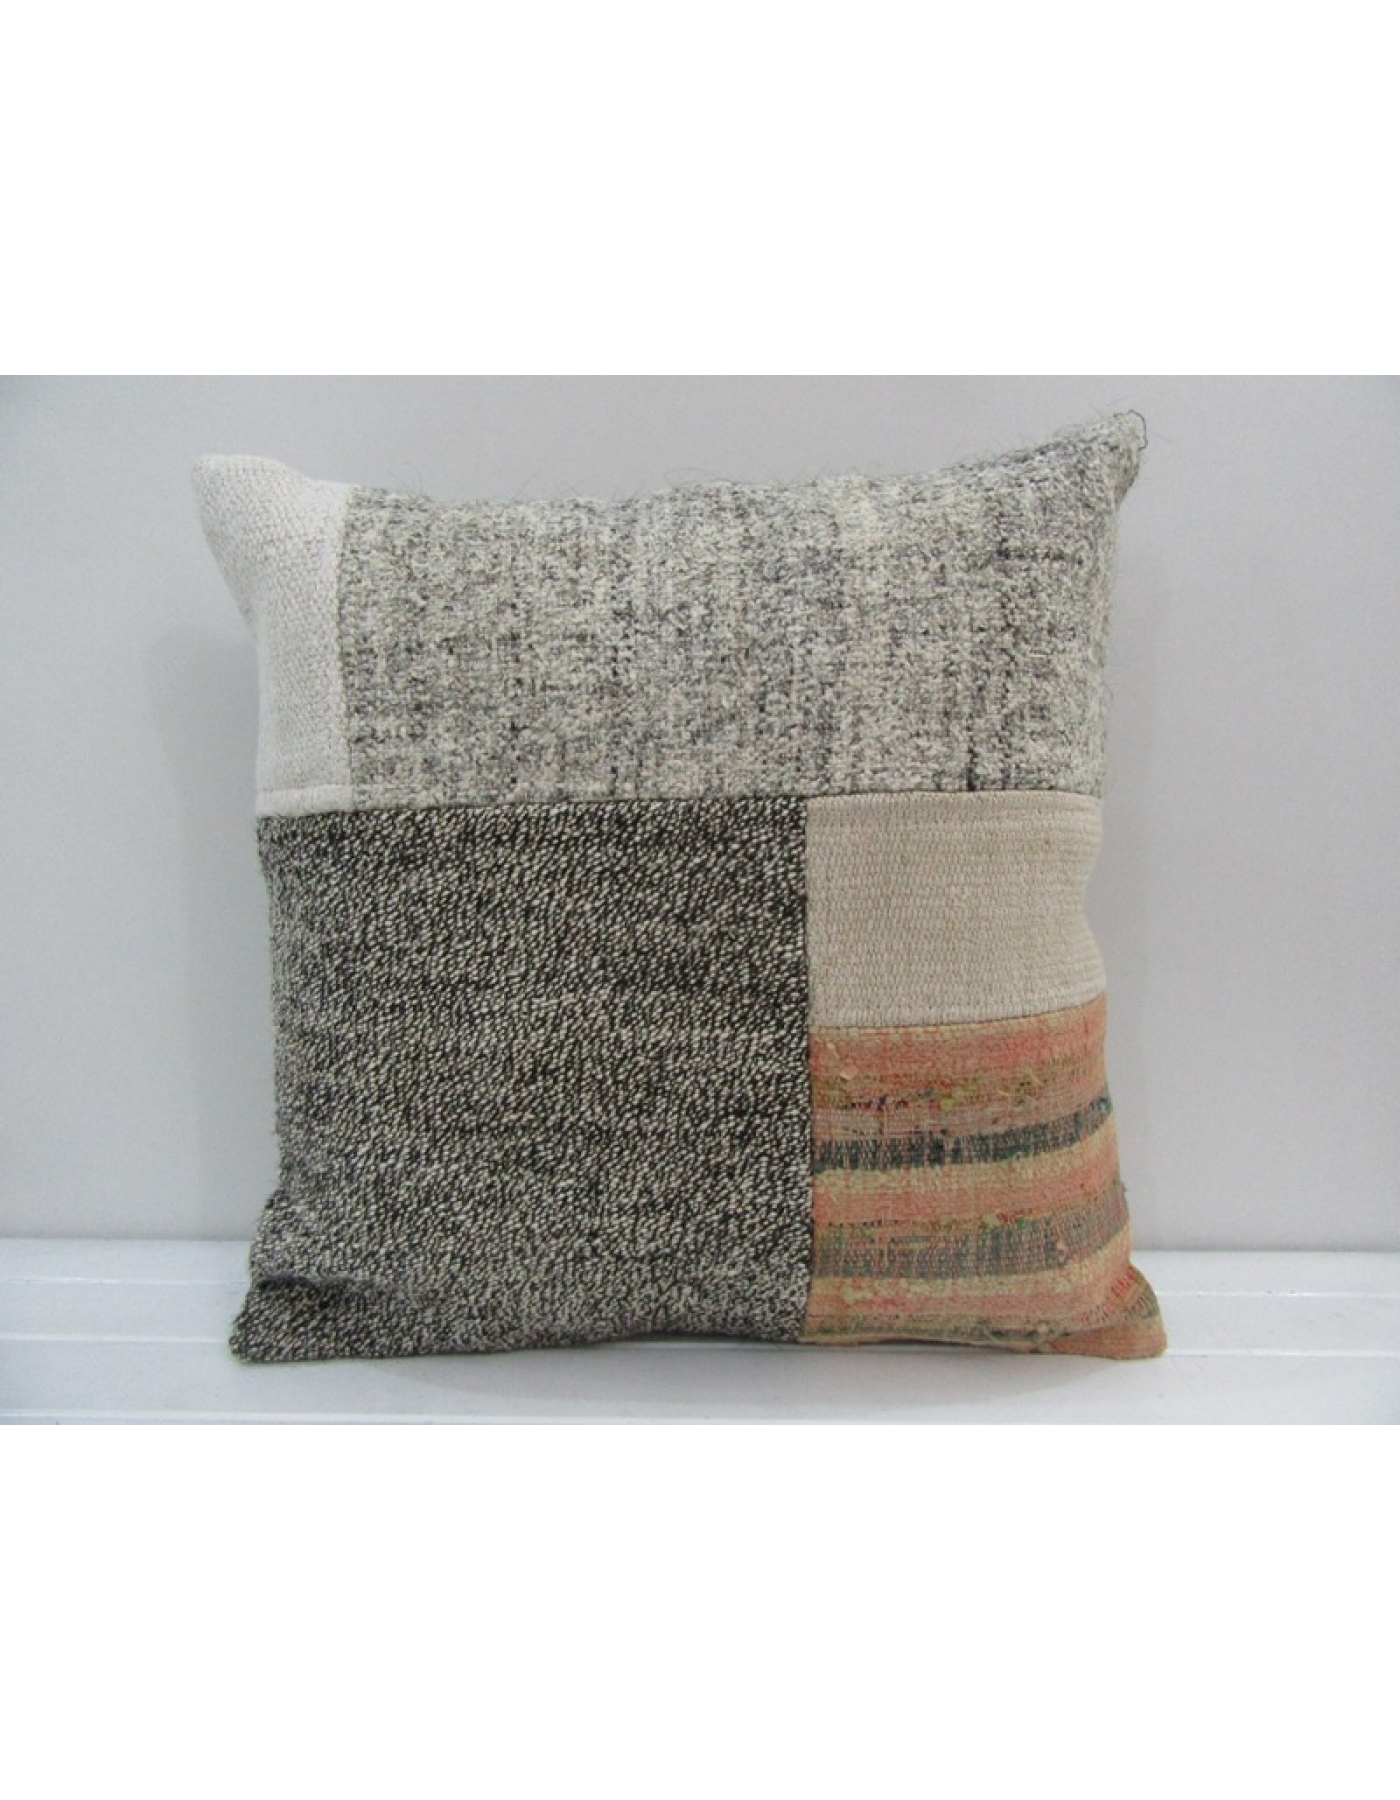 20x28 Gray Handmade decorative Turkish kilim pillow cover